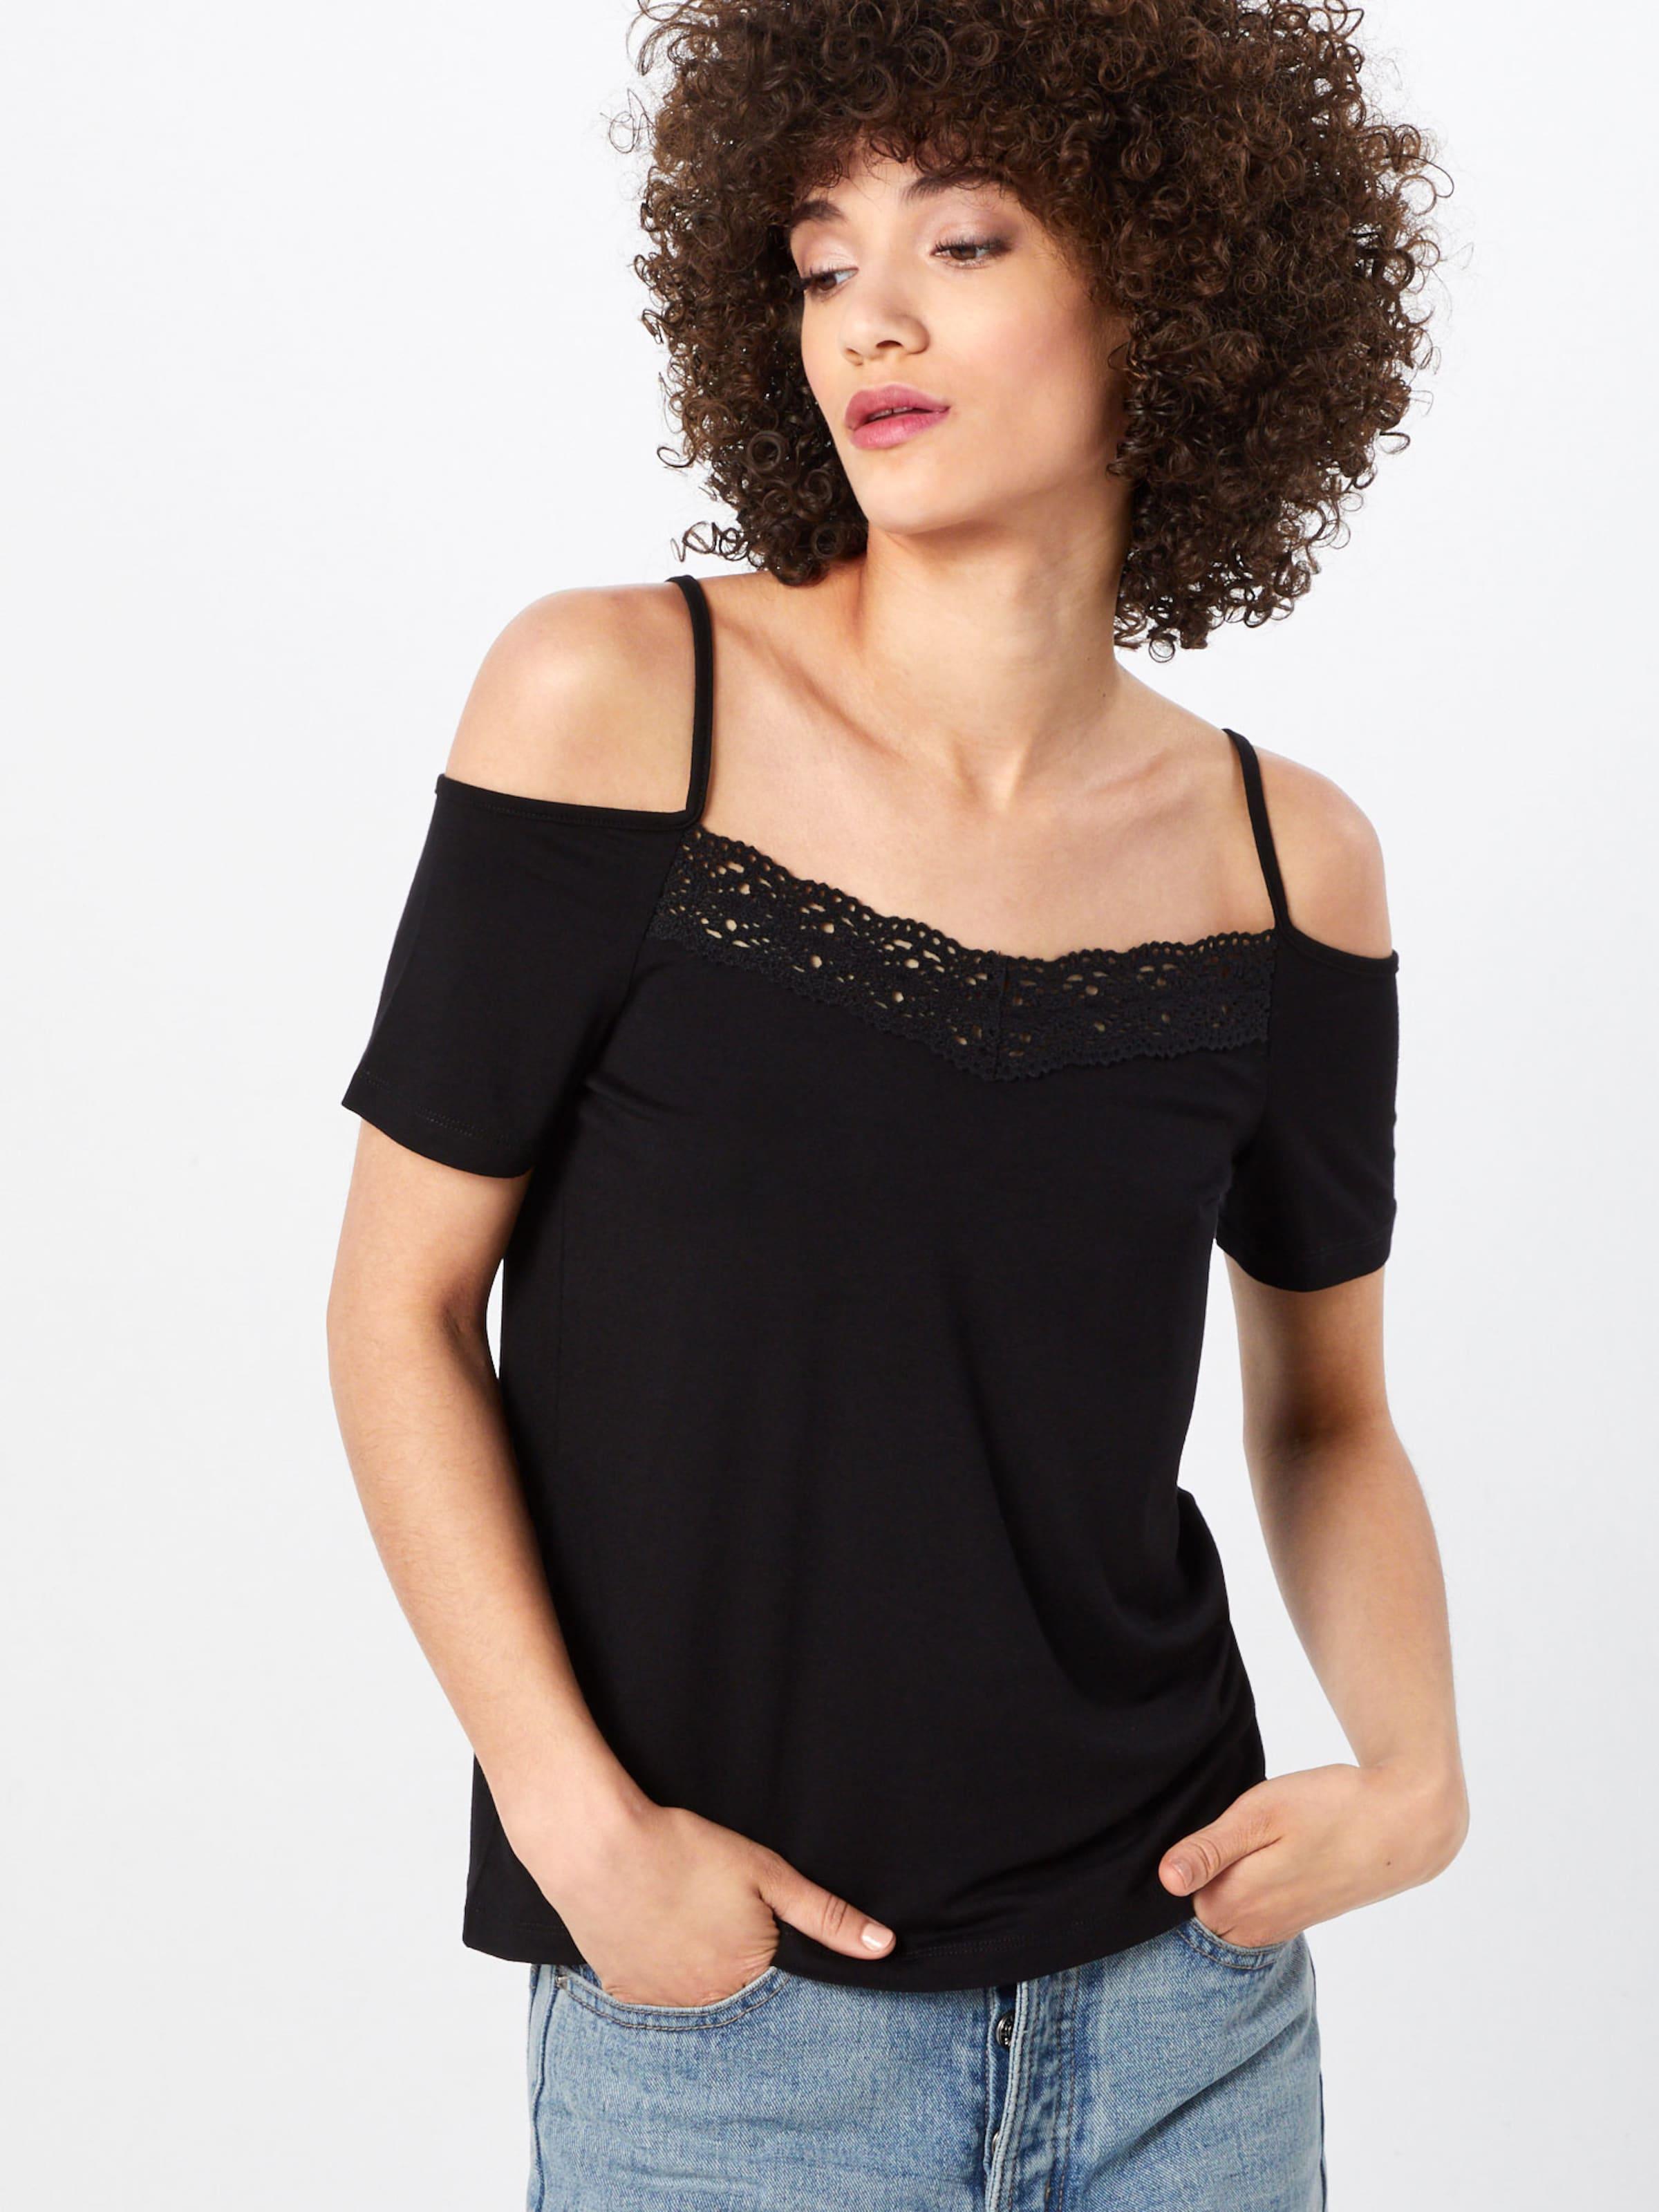 shirt En About Noir T 'teresa' You JlFc1K